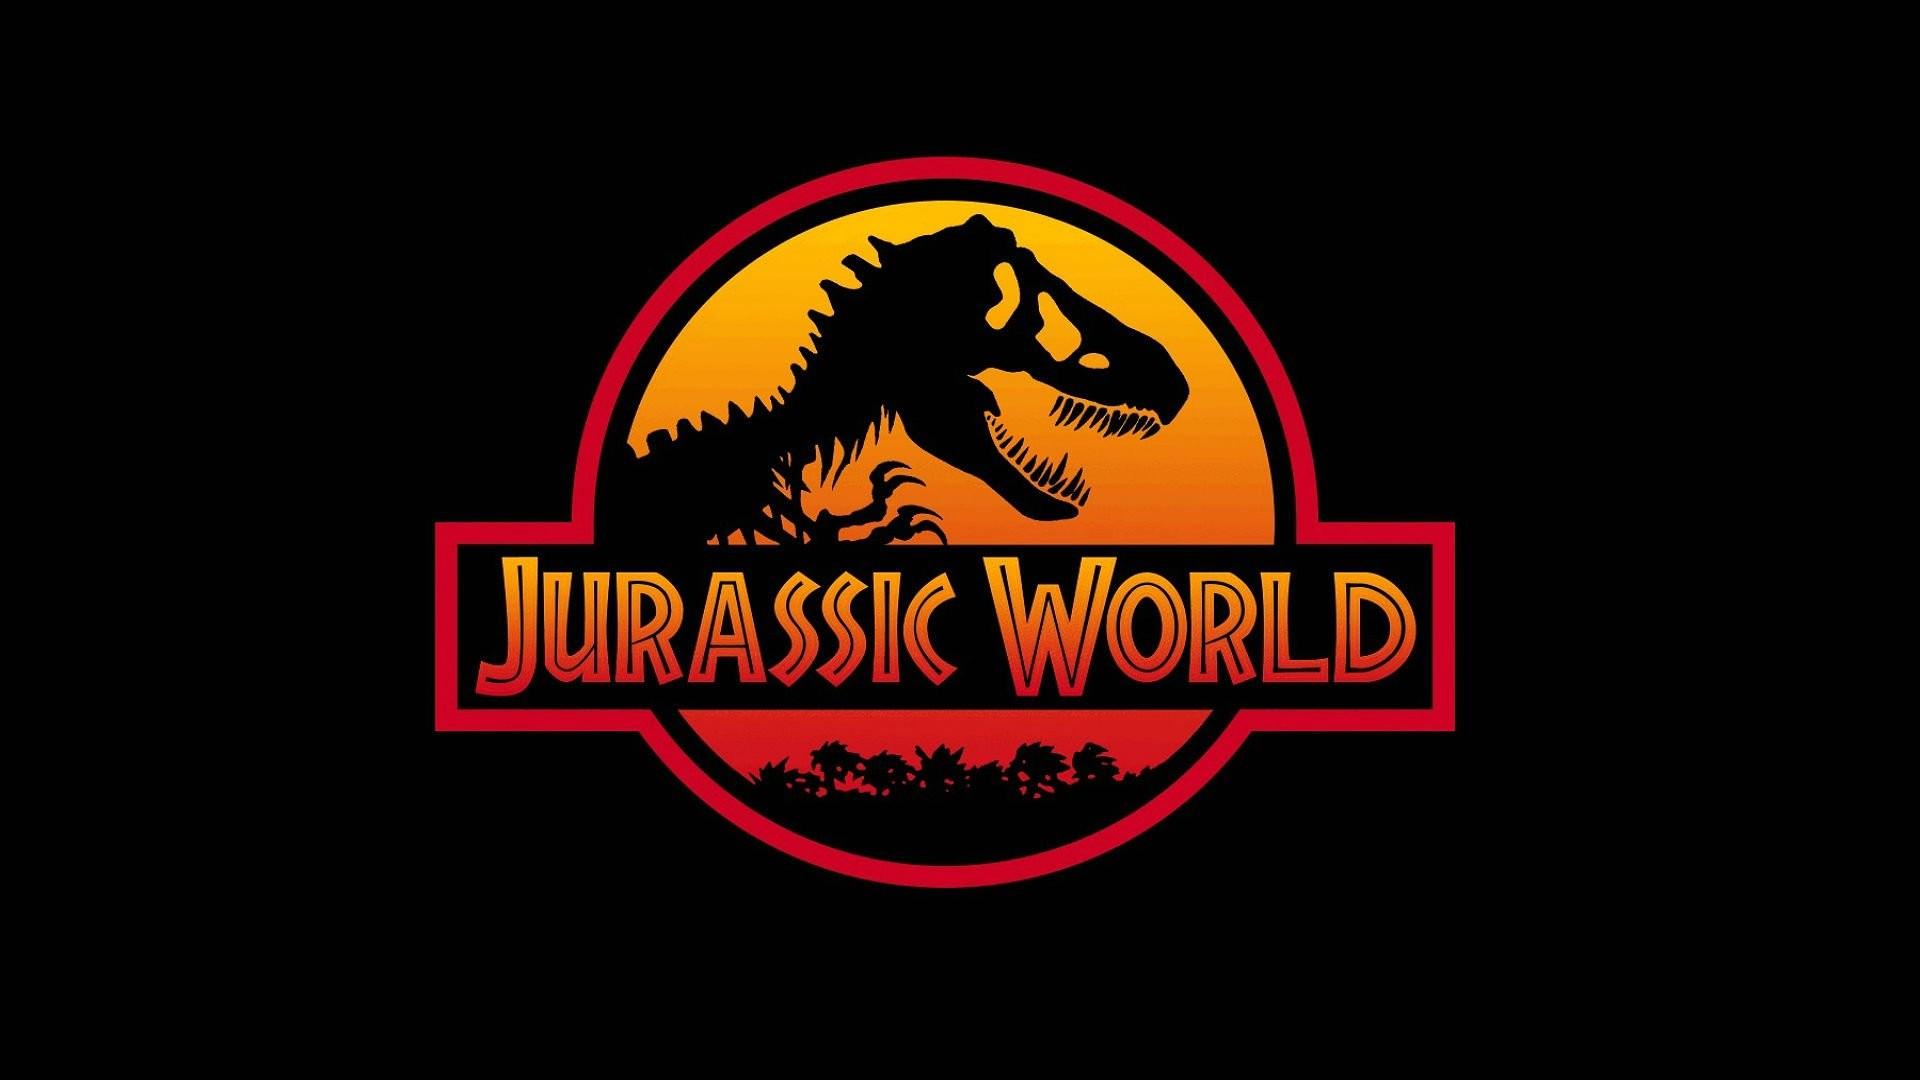 1920x1080 t rex jurassic world wallpaper Google Search DINOSAURIA   HD Wallpapers   Pinterest   Hd